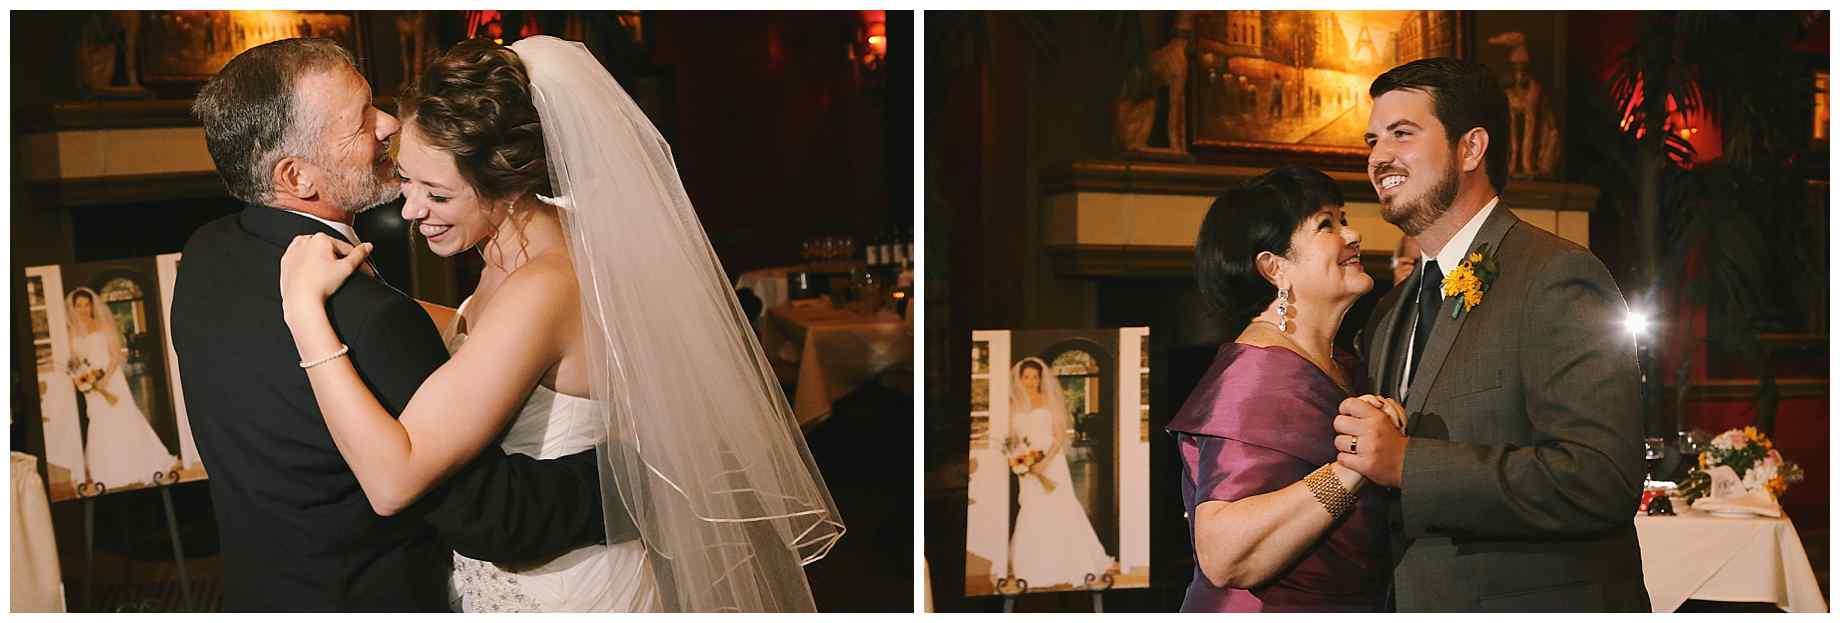 aggie-century-tree-wedding-27